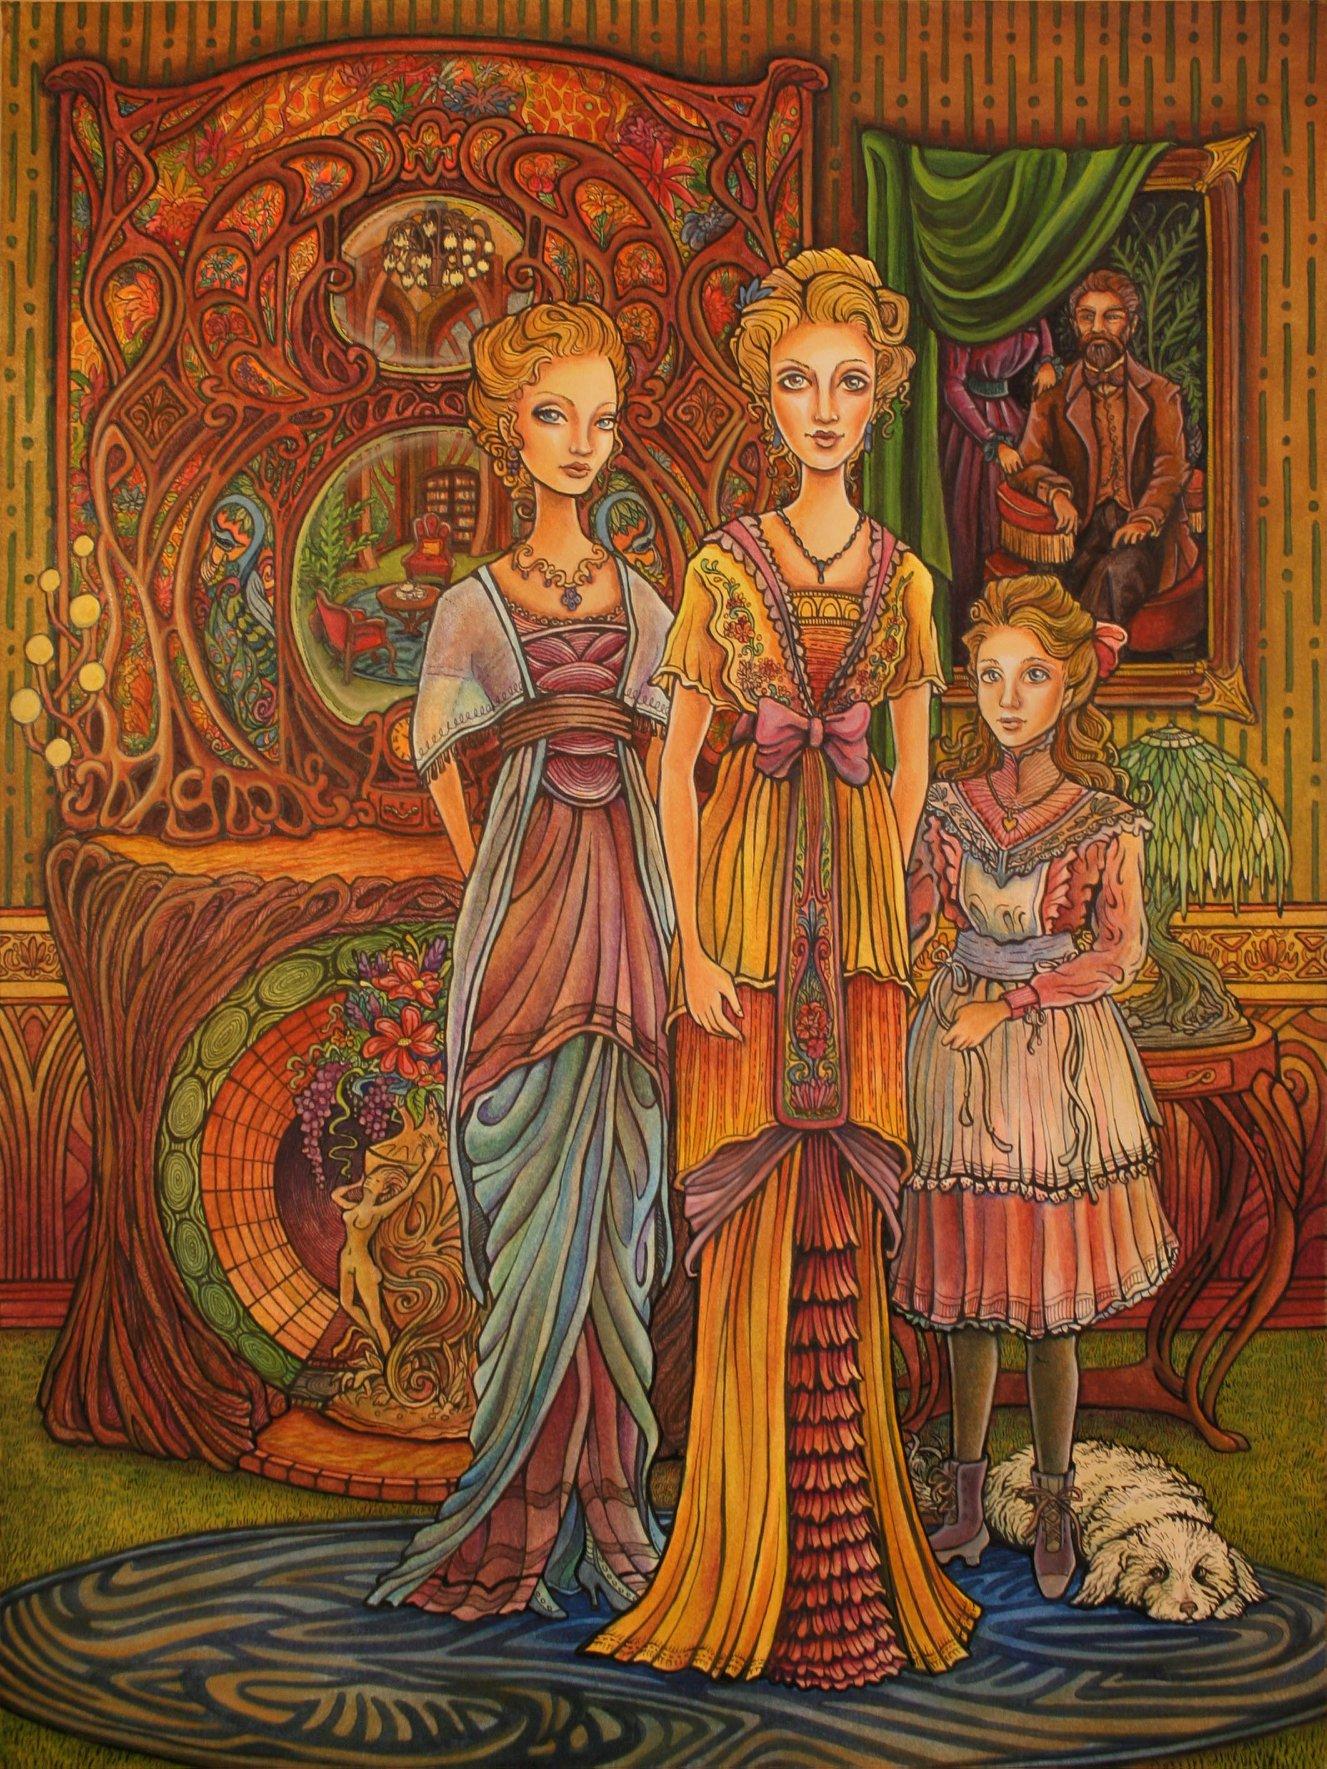 Edwardian Victorian family portrait. Childrens book historical fashion illustration.